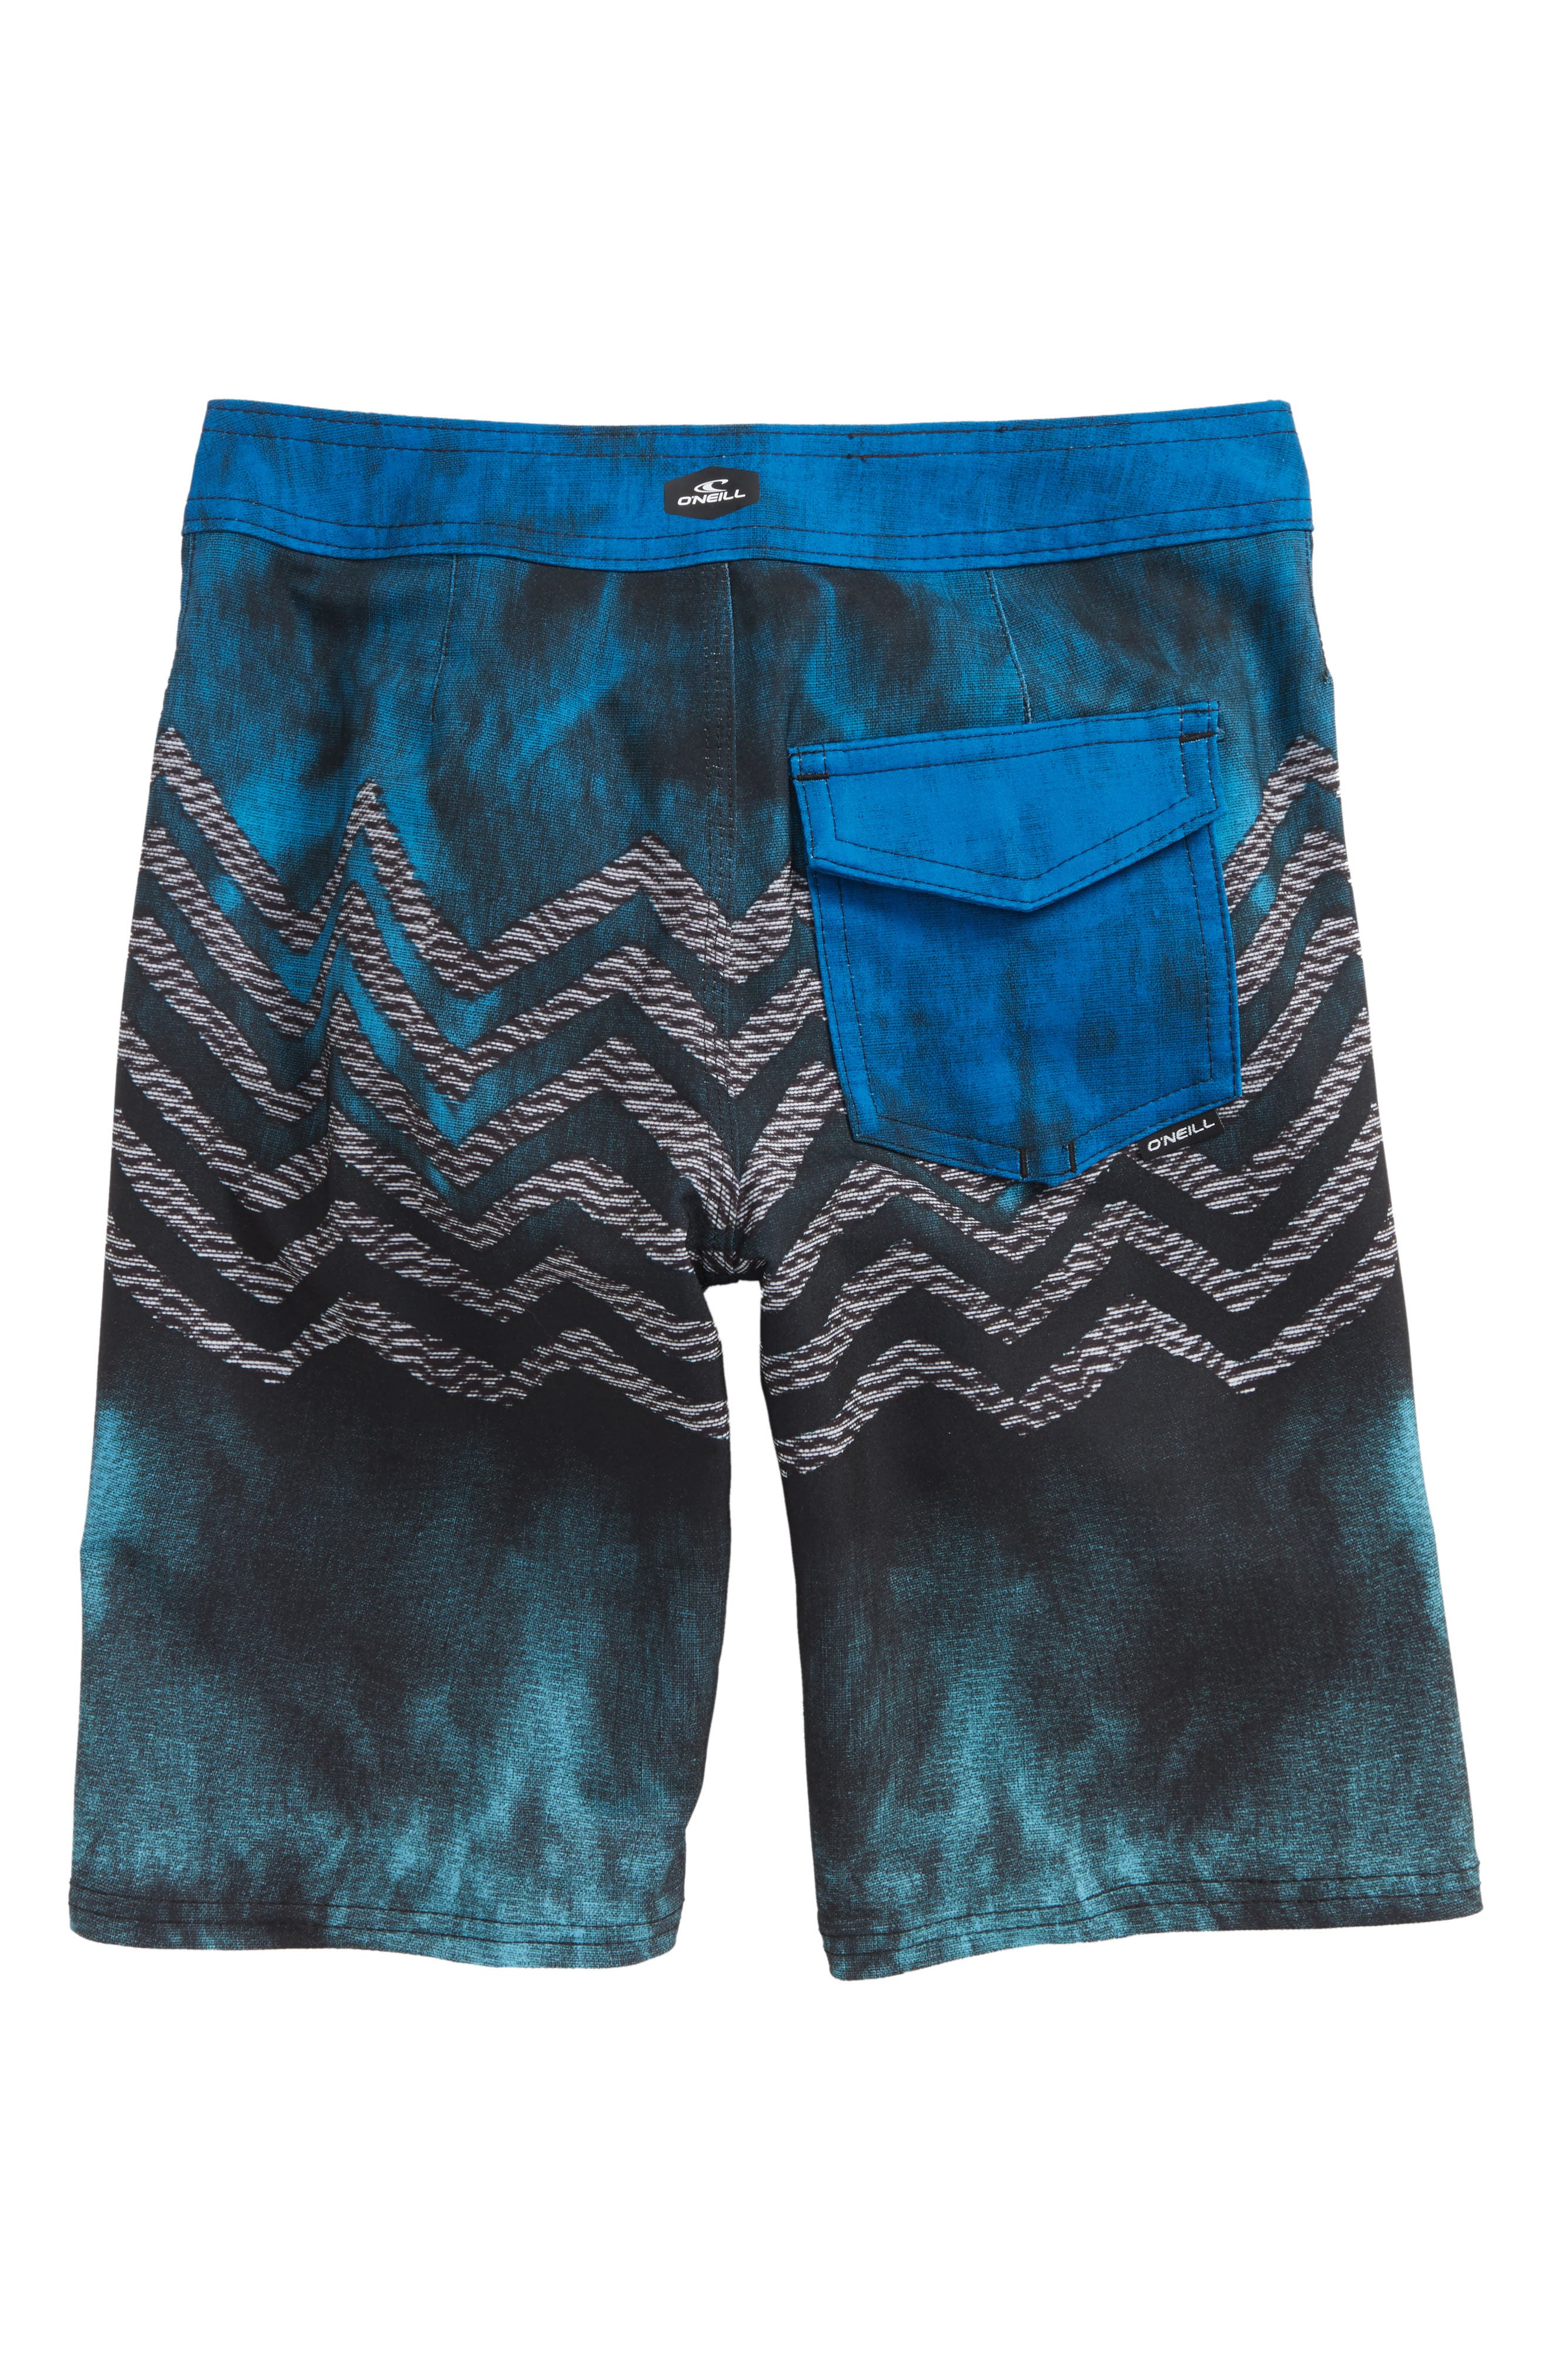 Hyperfreak Zigee Print Board Shorts,                             Alternate thumbnail 2, color,                             Blue